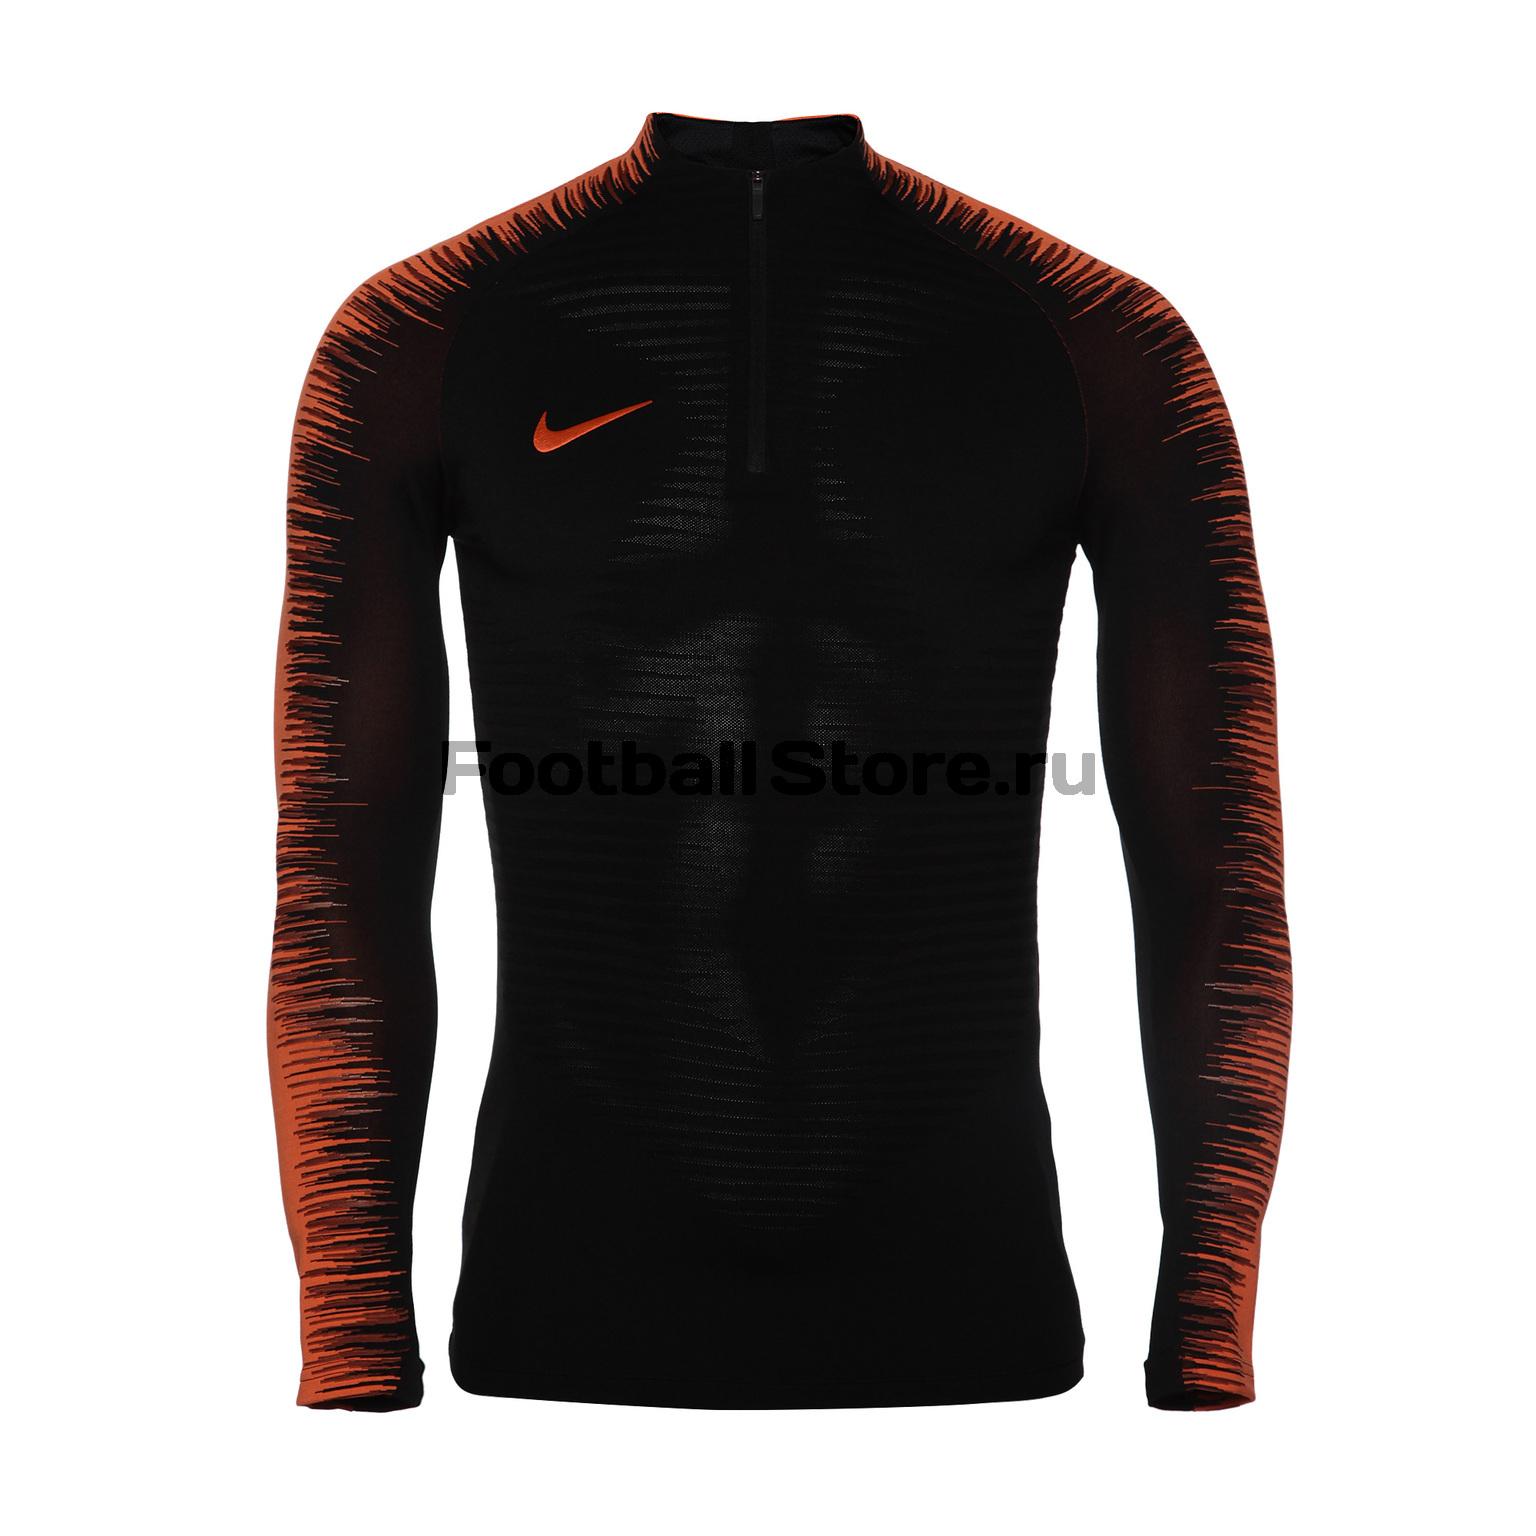 Свитер тренировочный Nike Vapor Strike 892707-011 nike брюки тренировочные nike strike pnt wp wz 688393 011